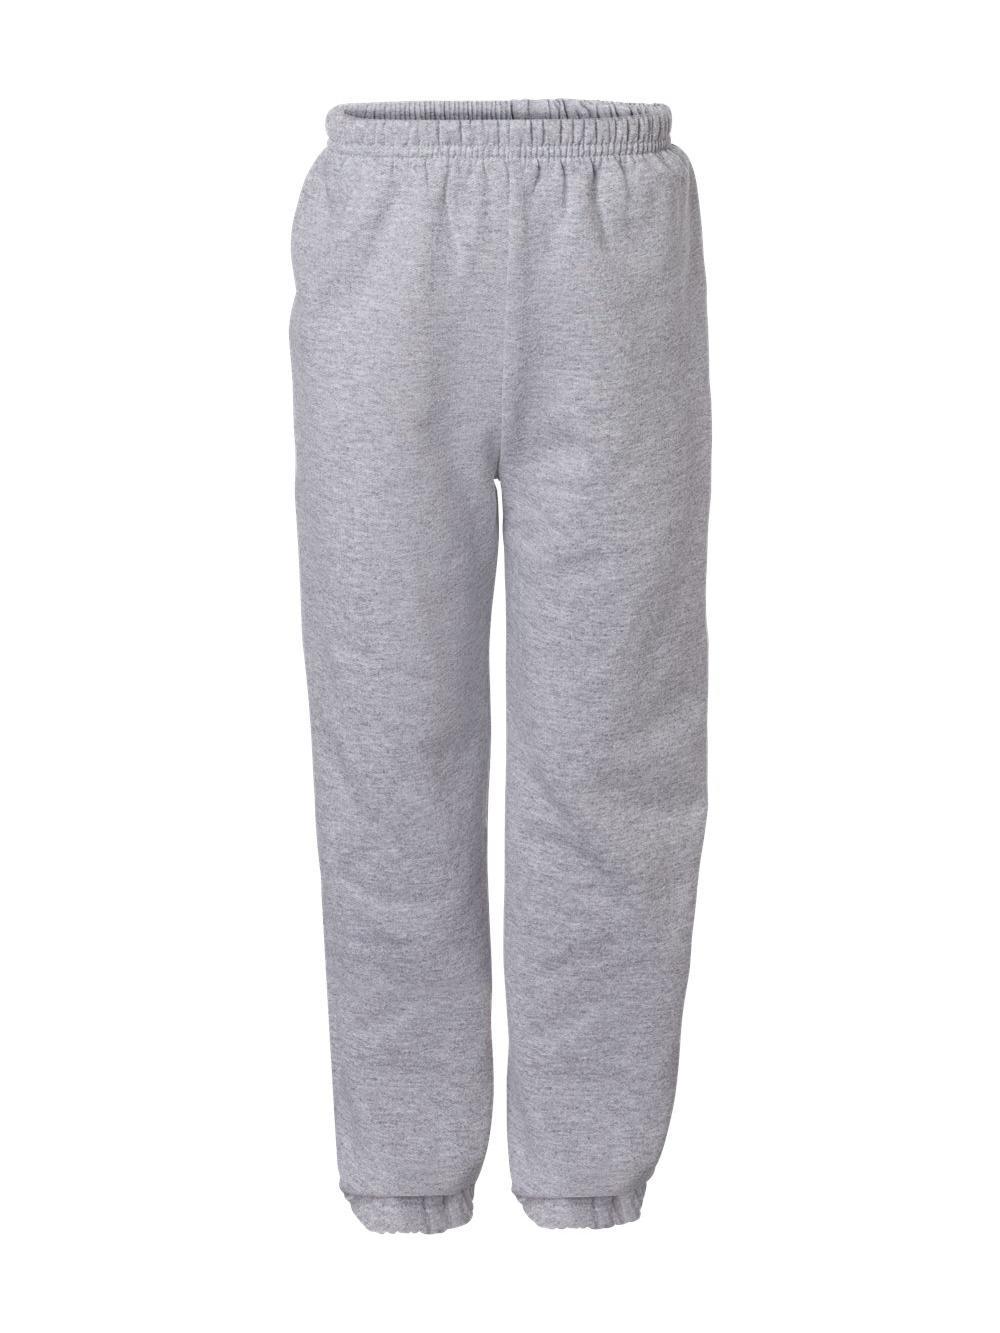 Gildan-Heavy-Blend-Youth-Sweatpants-18200B thumbnail 18